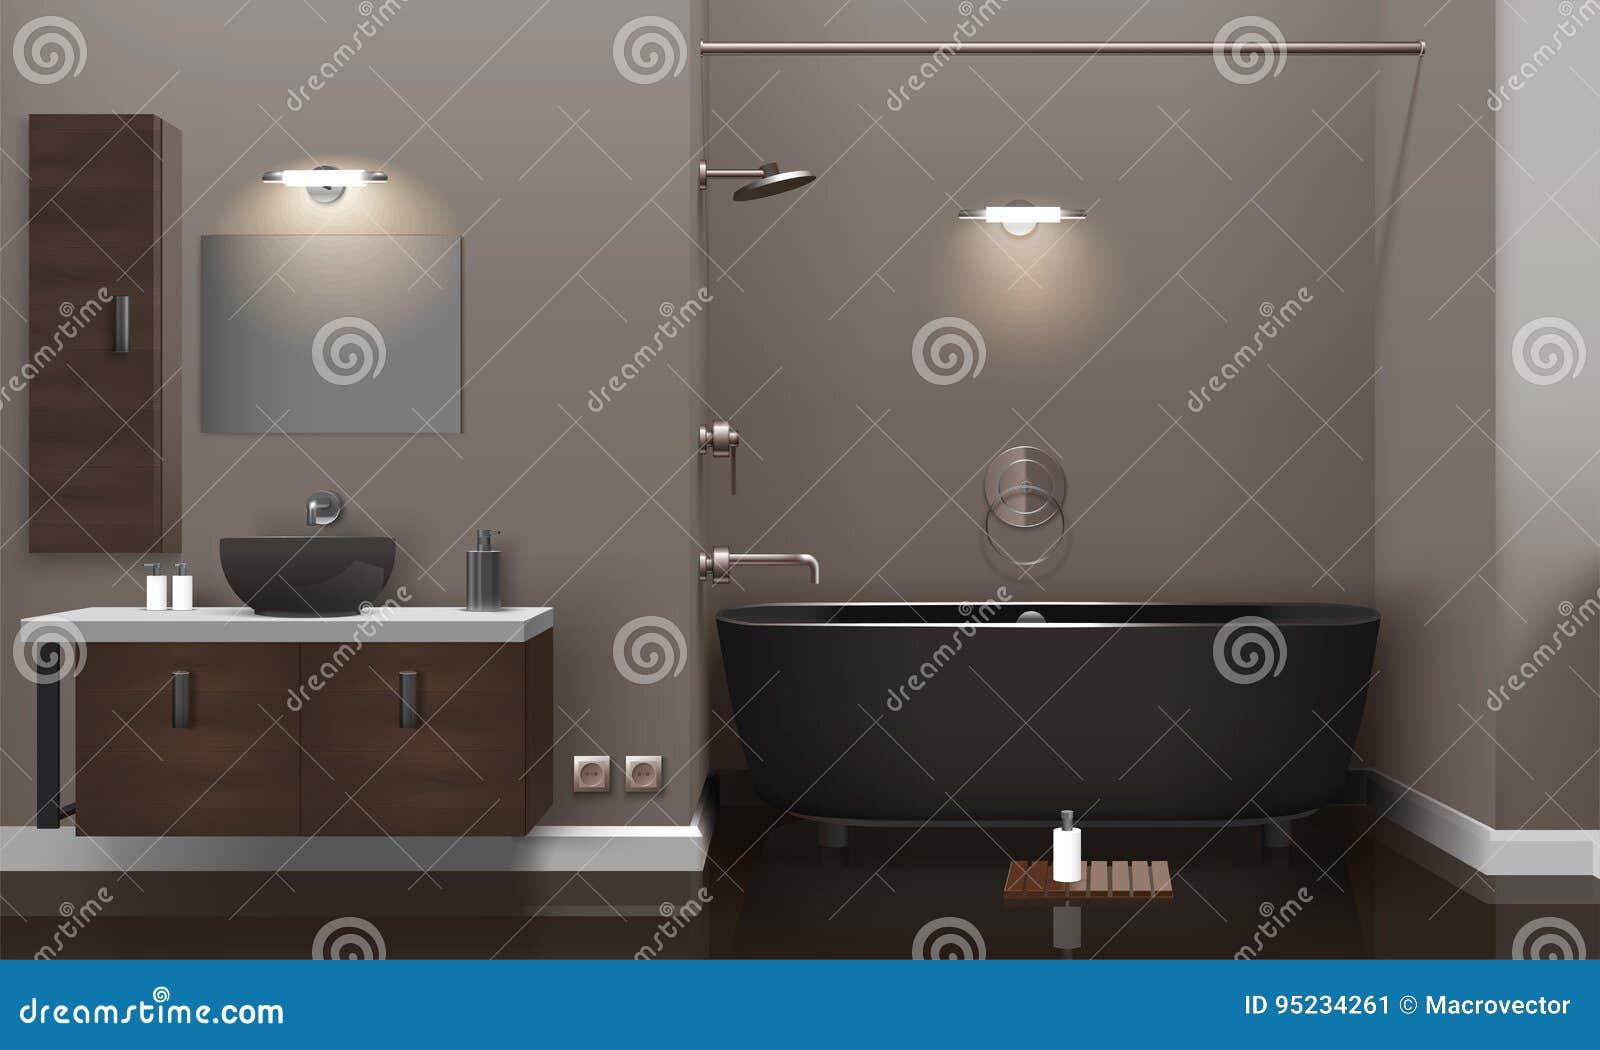 Realistic bathroom interior design stock vector illustration of